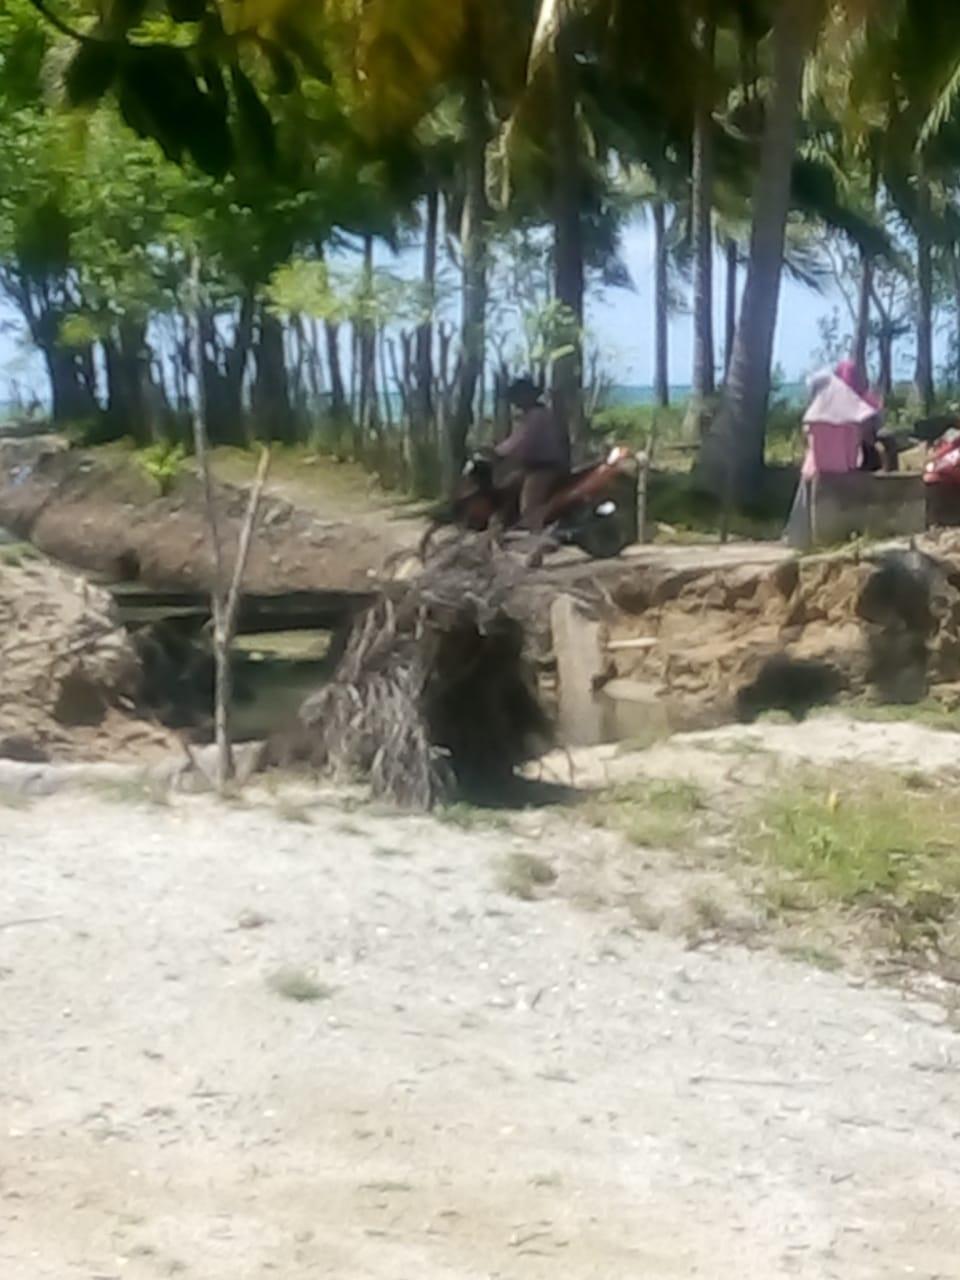 Dampak Penambangan Pasir Ilegal di Selayar, Duicker di Kampung Nane Ambruk